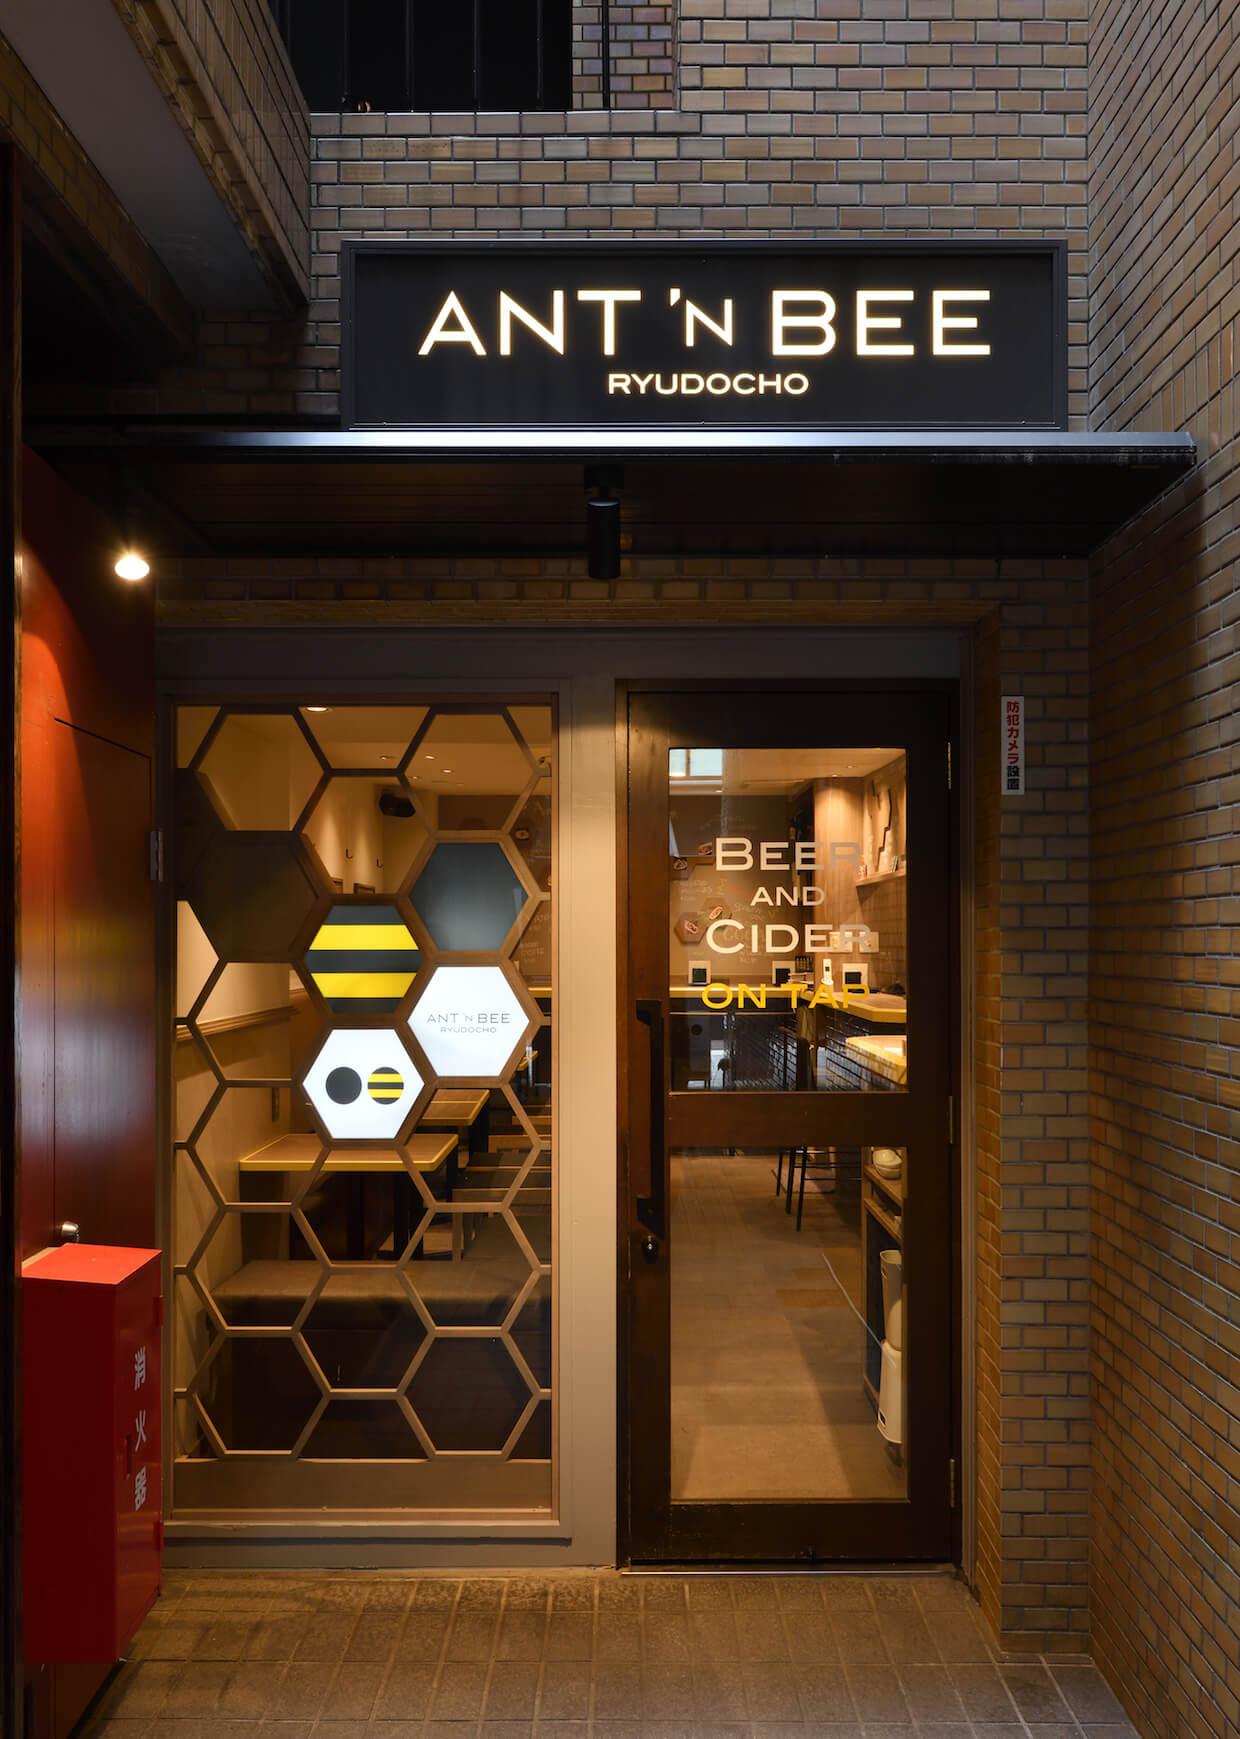 「ANT'N BEE RYUDOCHO 」竣工写真